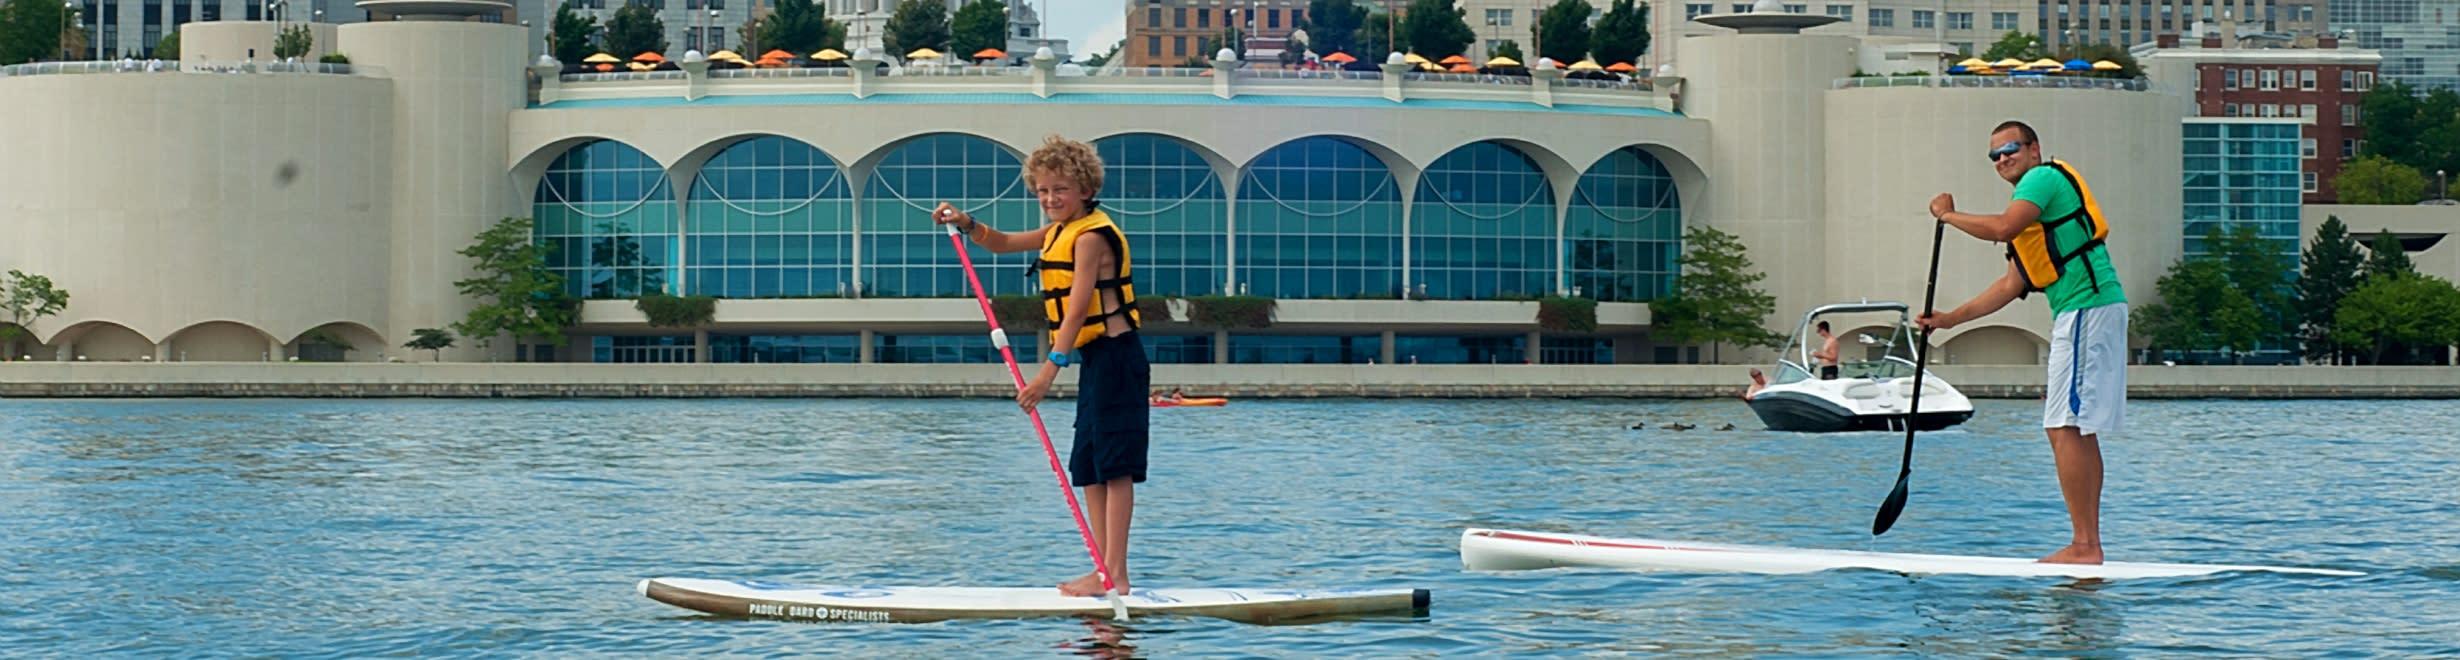 Stand Up Paddleboarding, Monona Terrace